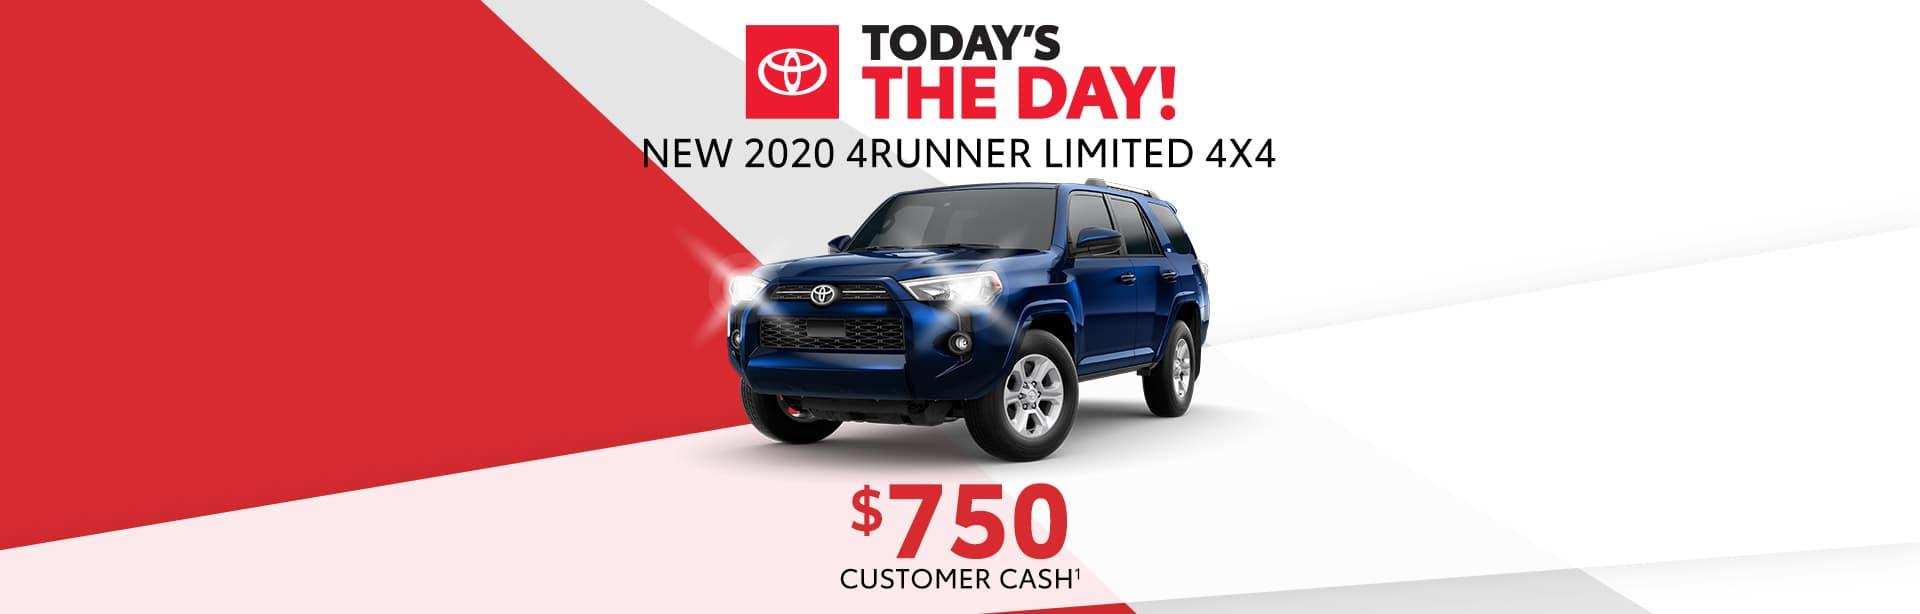 $750 Customer cash when you buy a new 4Runner near Franklin, Indiana